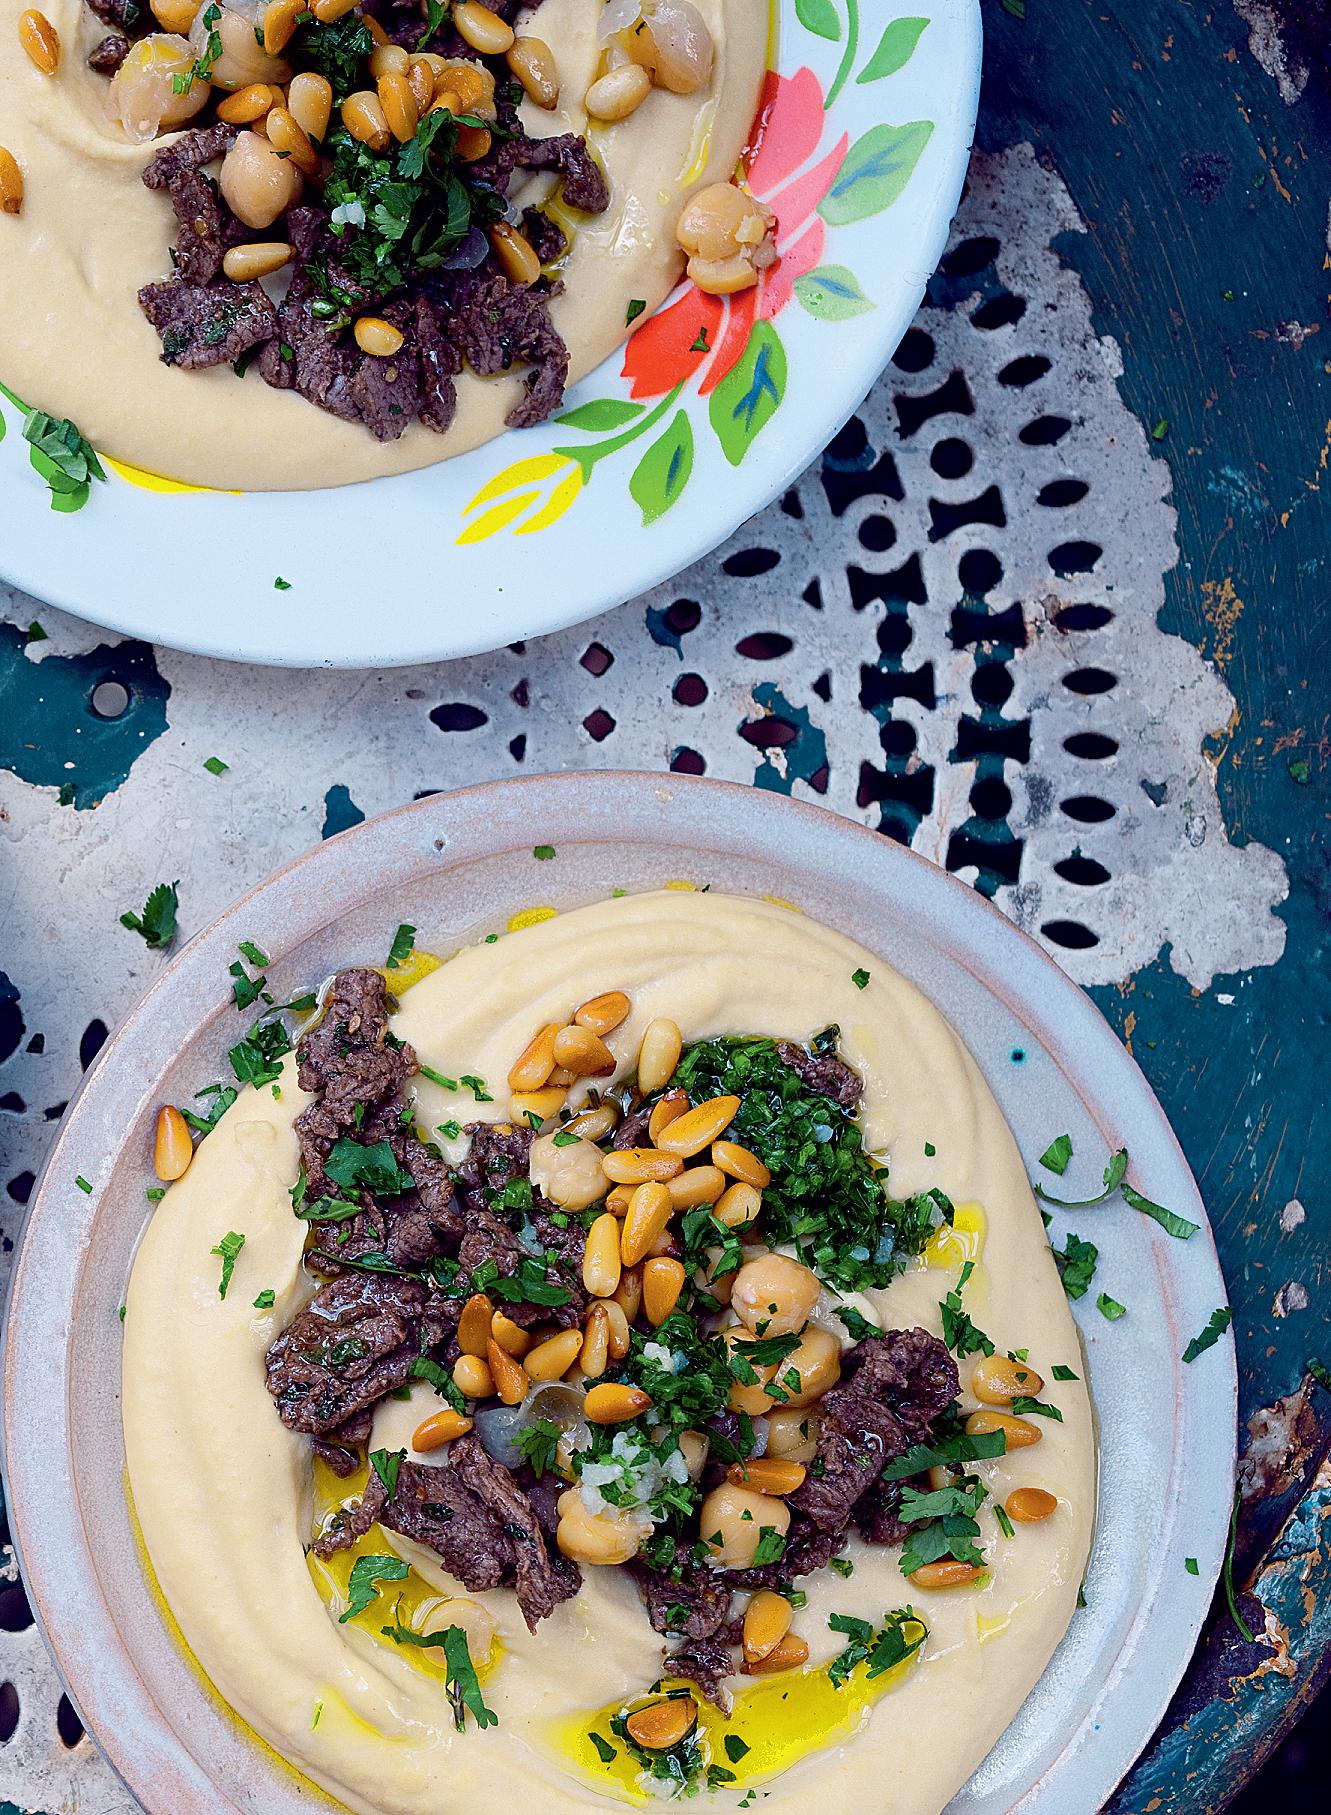 Hummus Kawarma with Lemon Sauce from Jerusalem